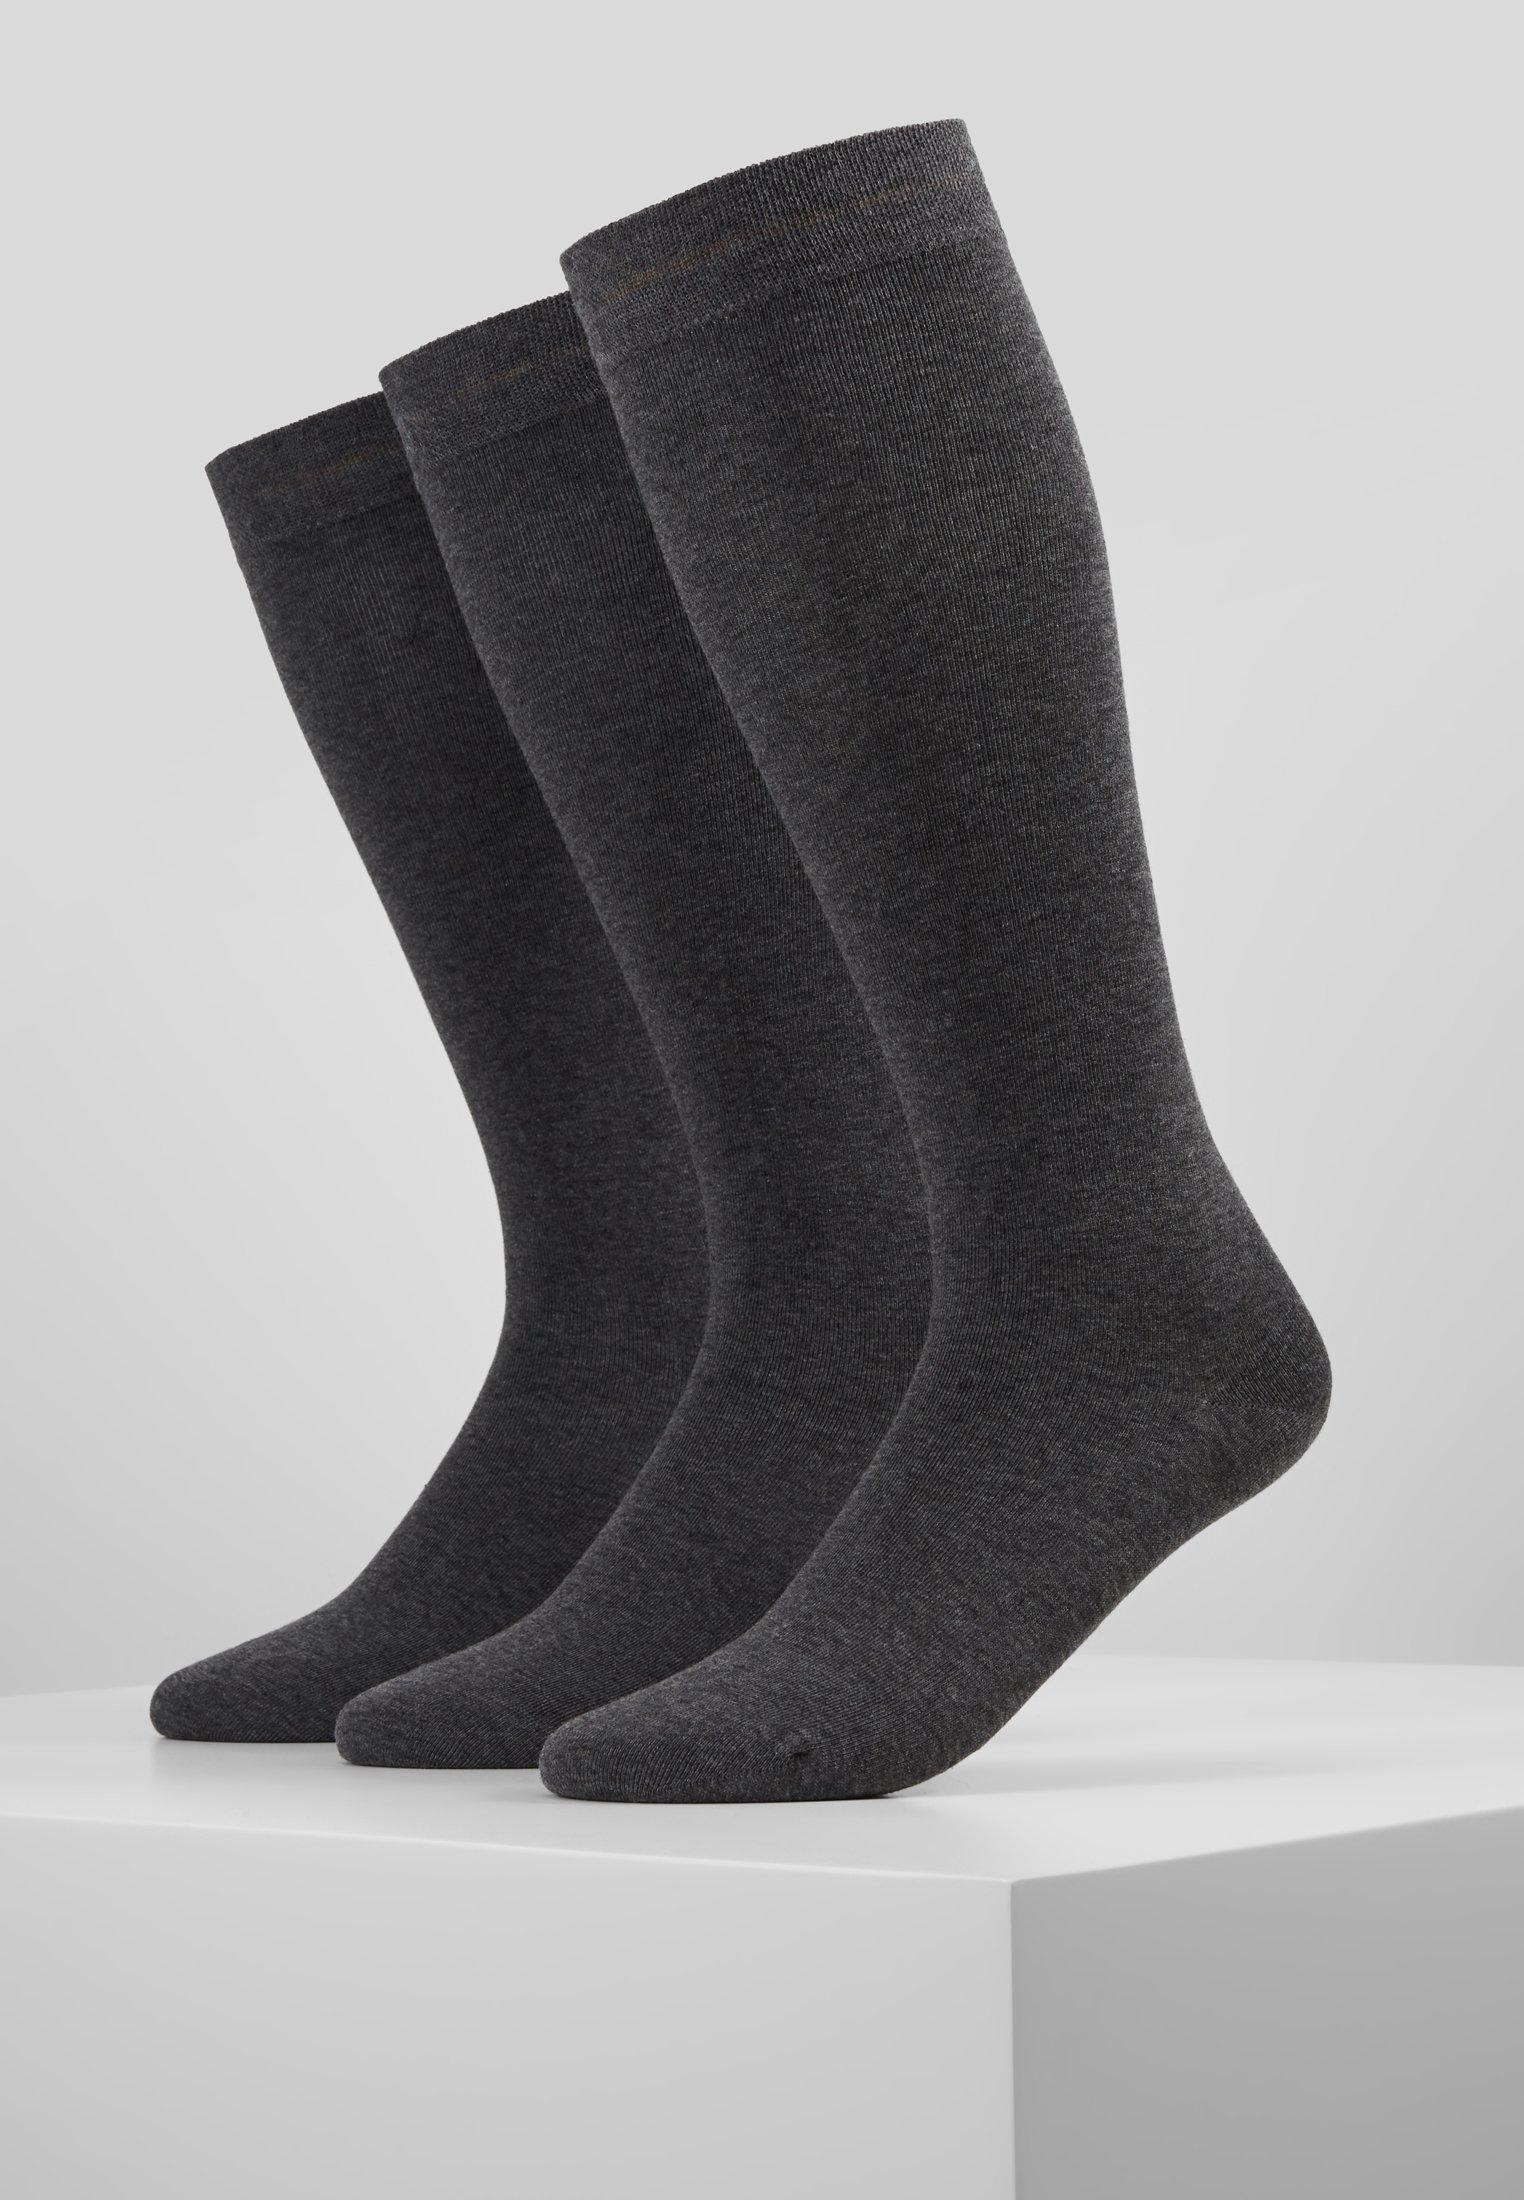 Women WOMEN SOFT KNEEHIGHS 3 PACK - Knee high socks